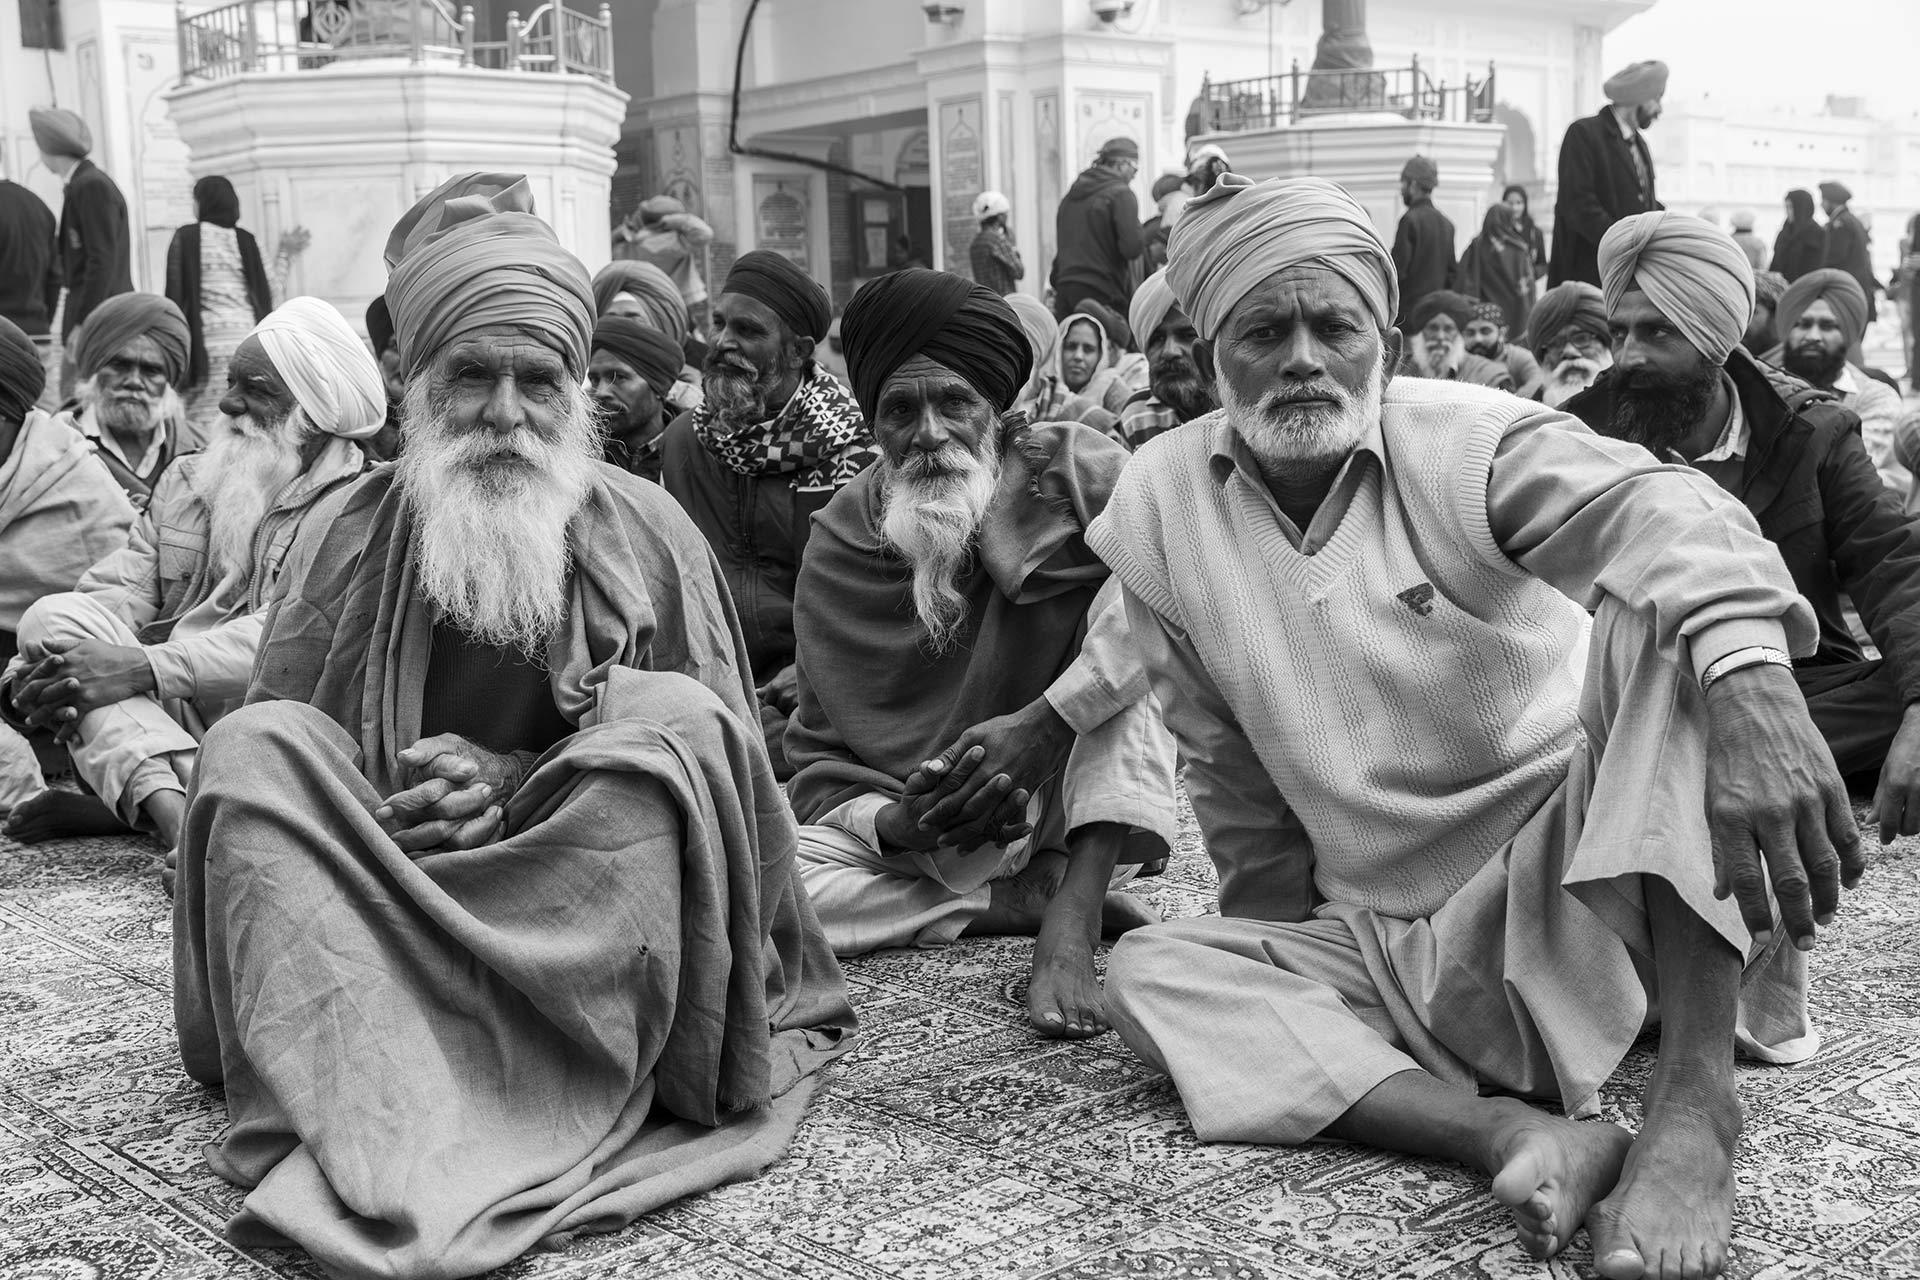 viaje-india-sikh